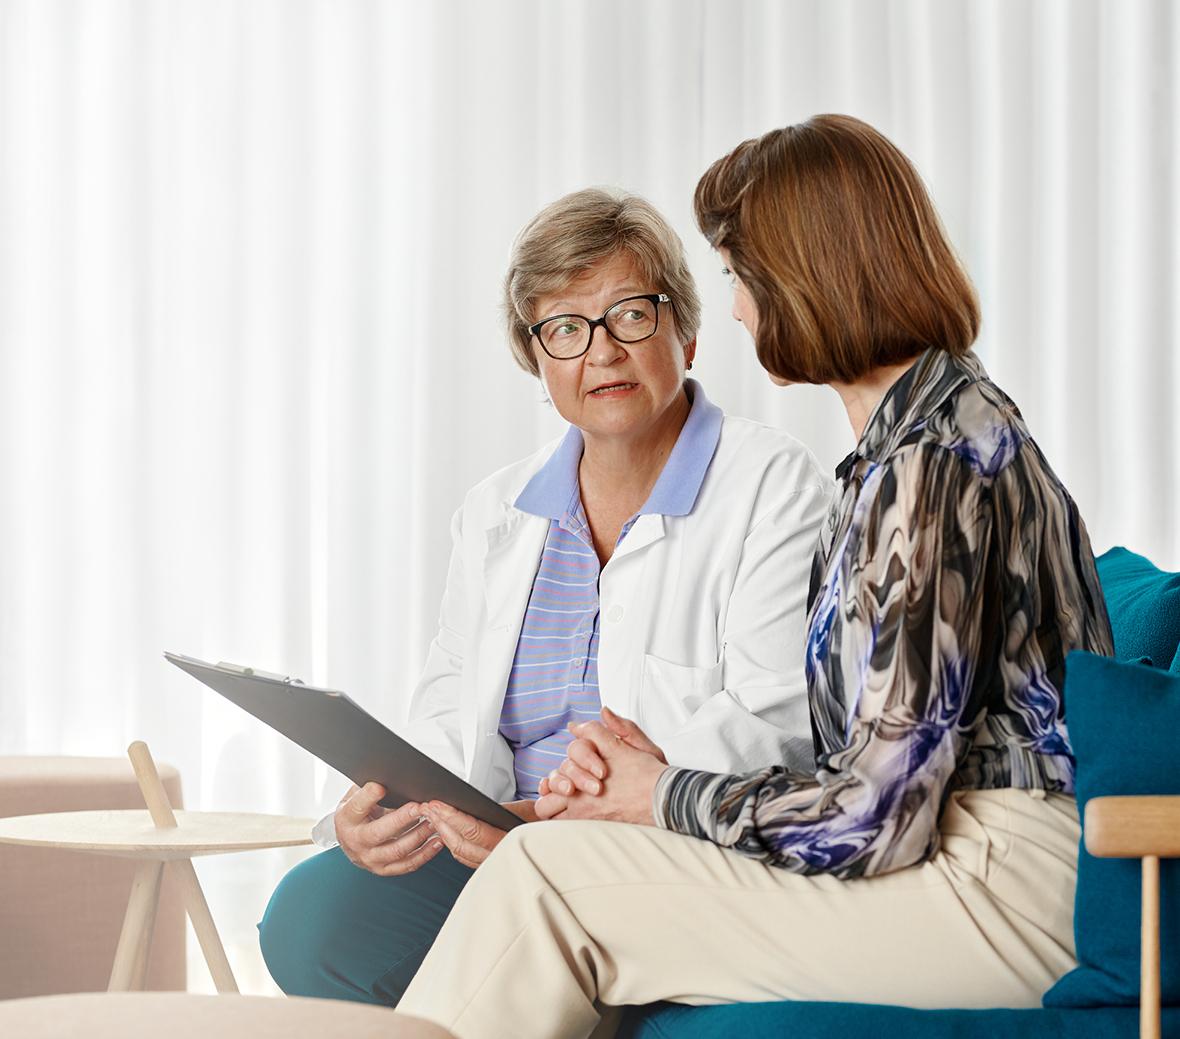 Docrates, Дократес, рак, рак груди, онкология, опухоль, Финляндия, лечение, геномное профилирование, профилирование, тест, анализ, диагноз, виза